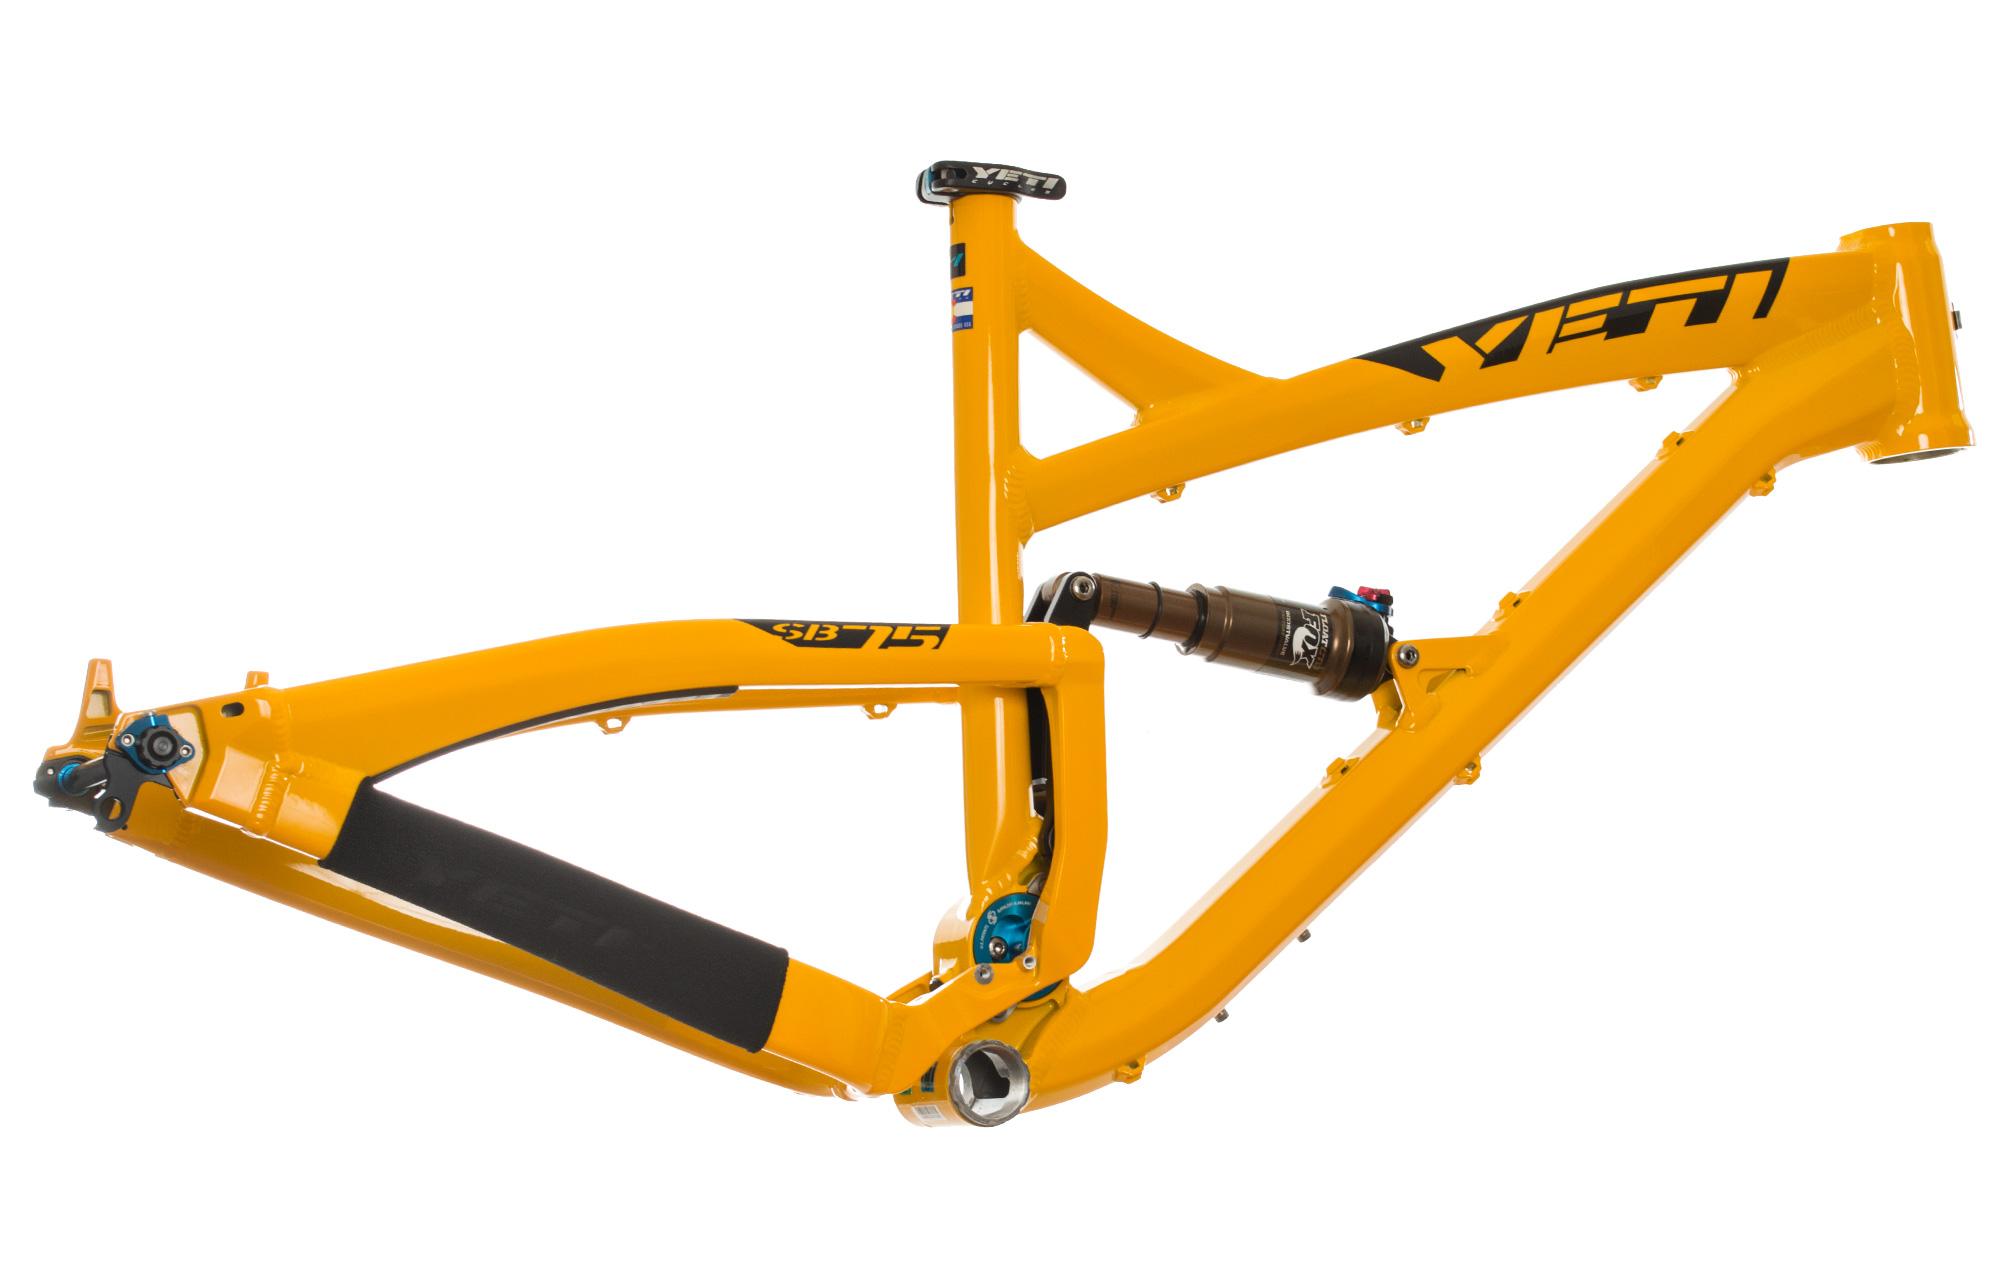 yeti 2014 frame sb75 alu rear shock fox ctd 27 5 39 39 yellow alltricks. Black Bedroom Furniture Sets. Home Design Ideas